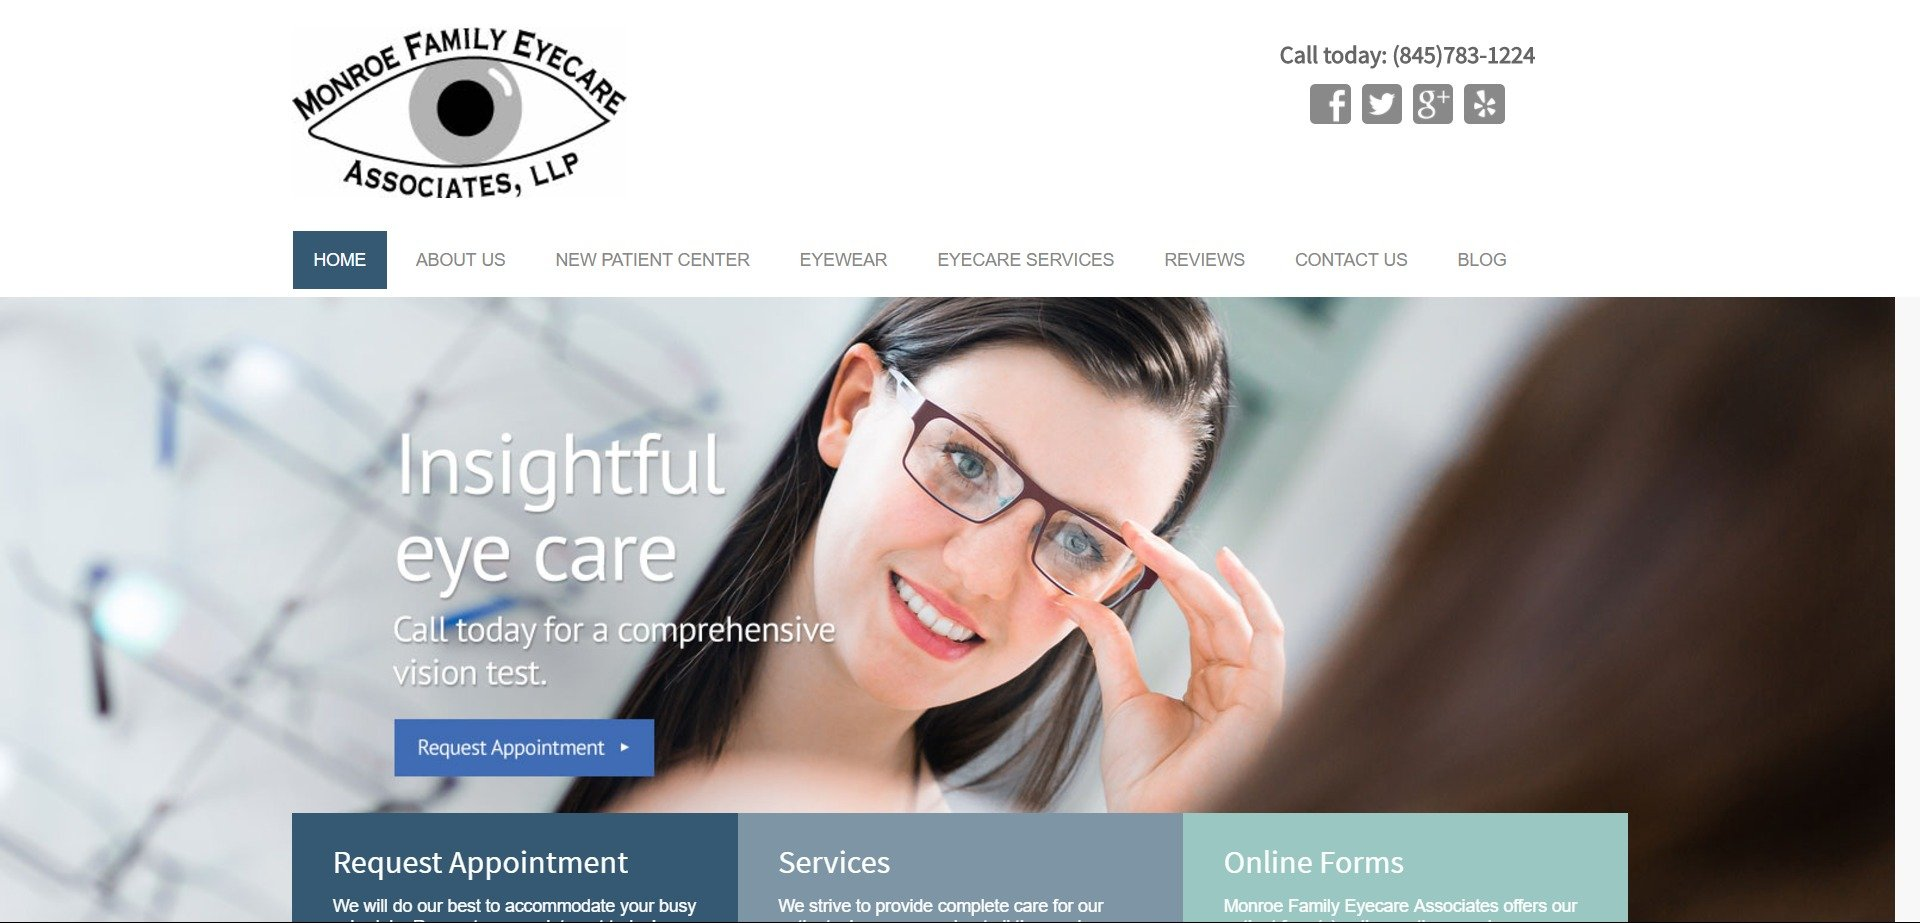 best-optometry-websites-www.monroefamilyeye.com